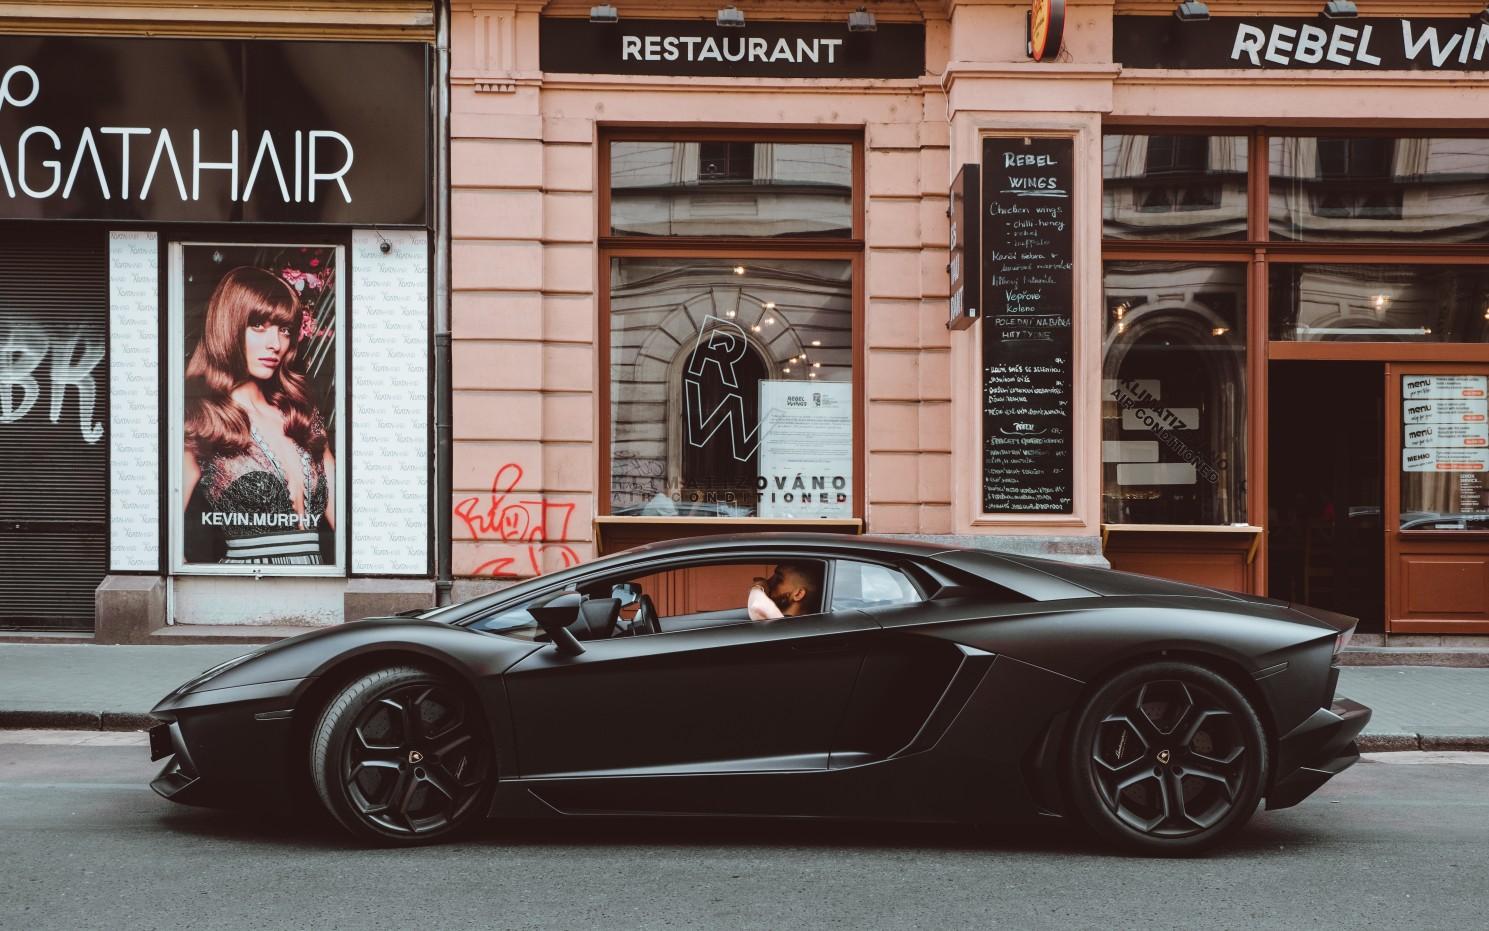 Black Lamborghini Aventador is standing in front of the restaurant.